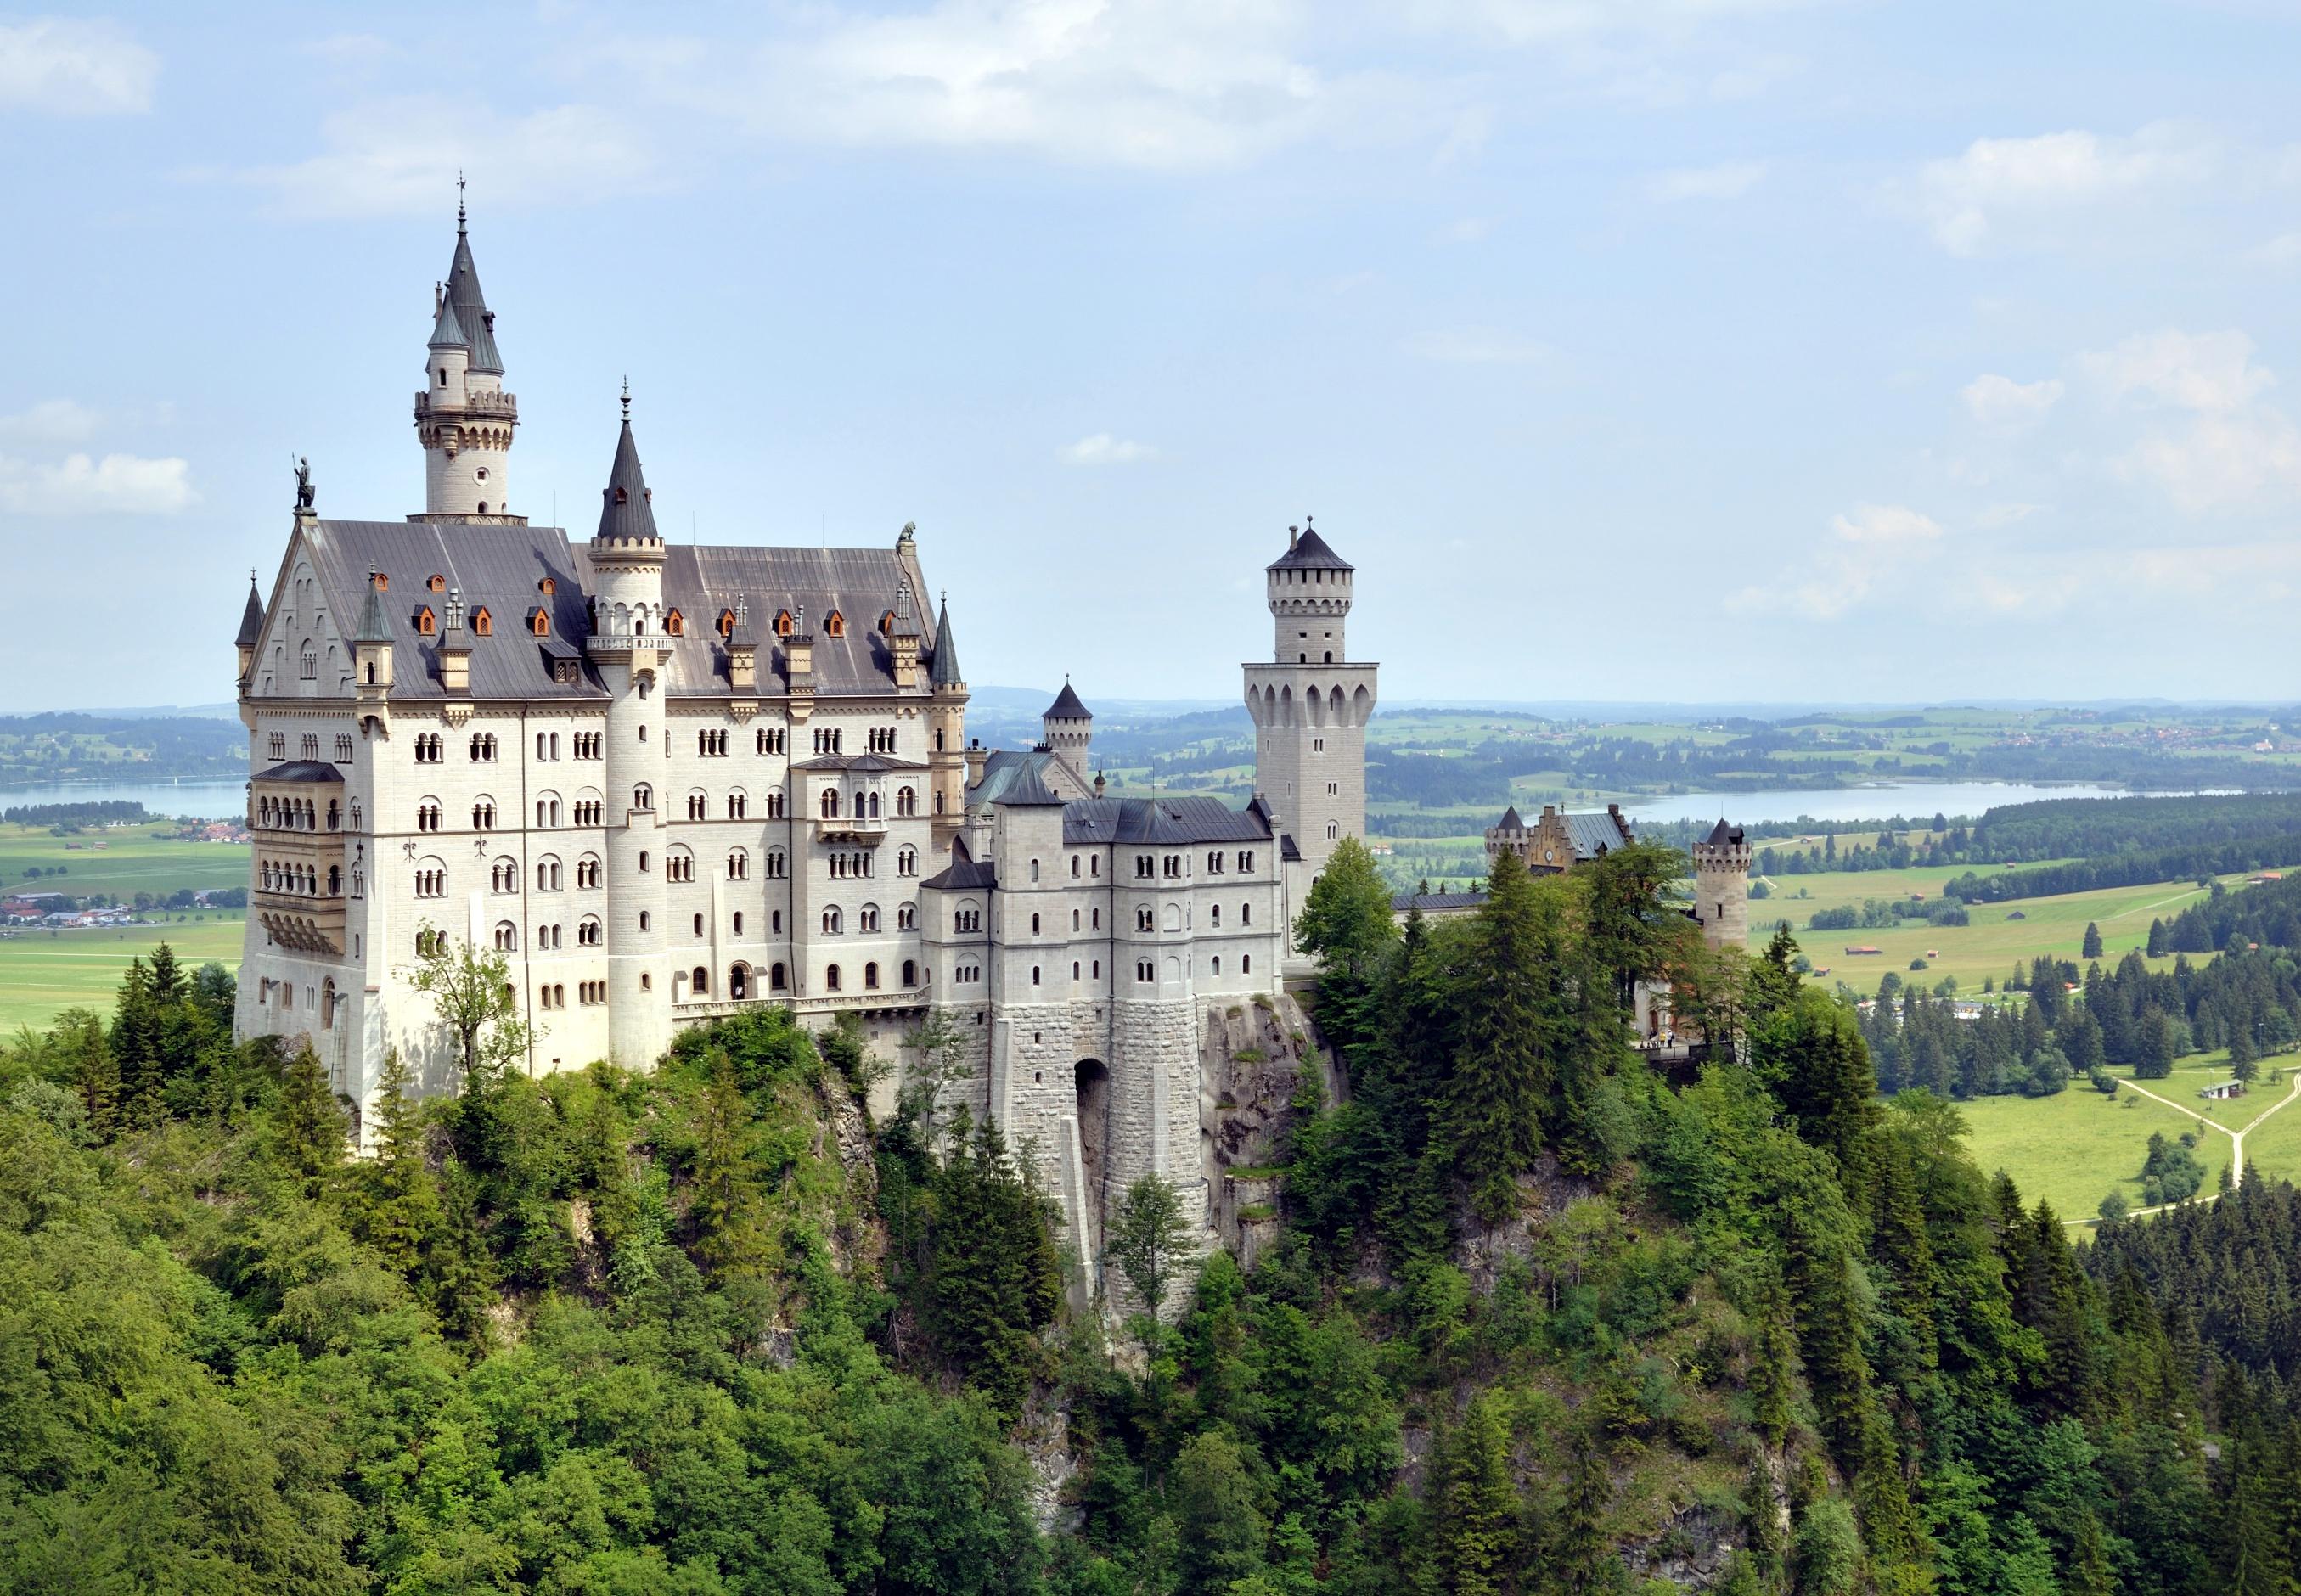 https://upload.wikimedia.org/wikipedia/commons/f/ff/Hohenschwangau_-_Schloss_Neuschwanstein1.jpg